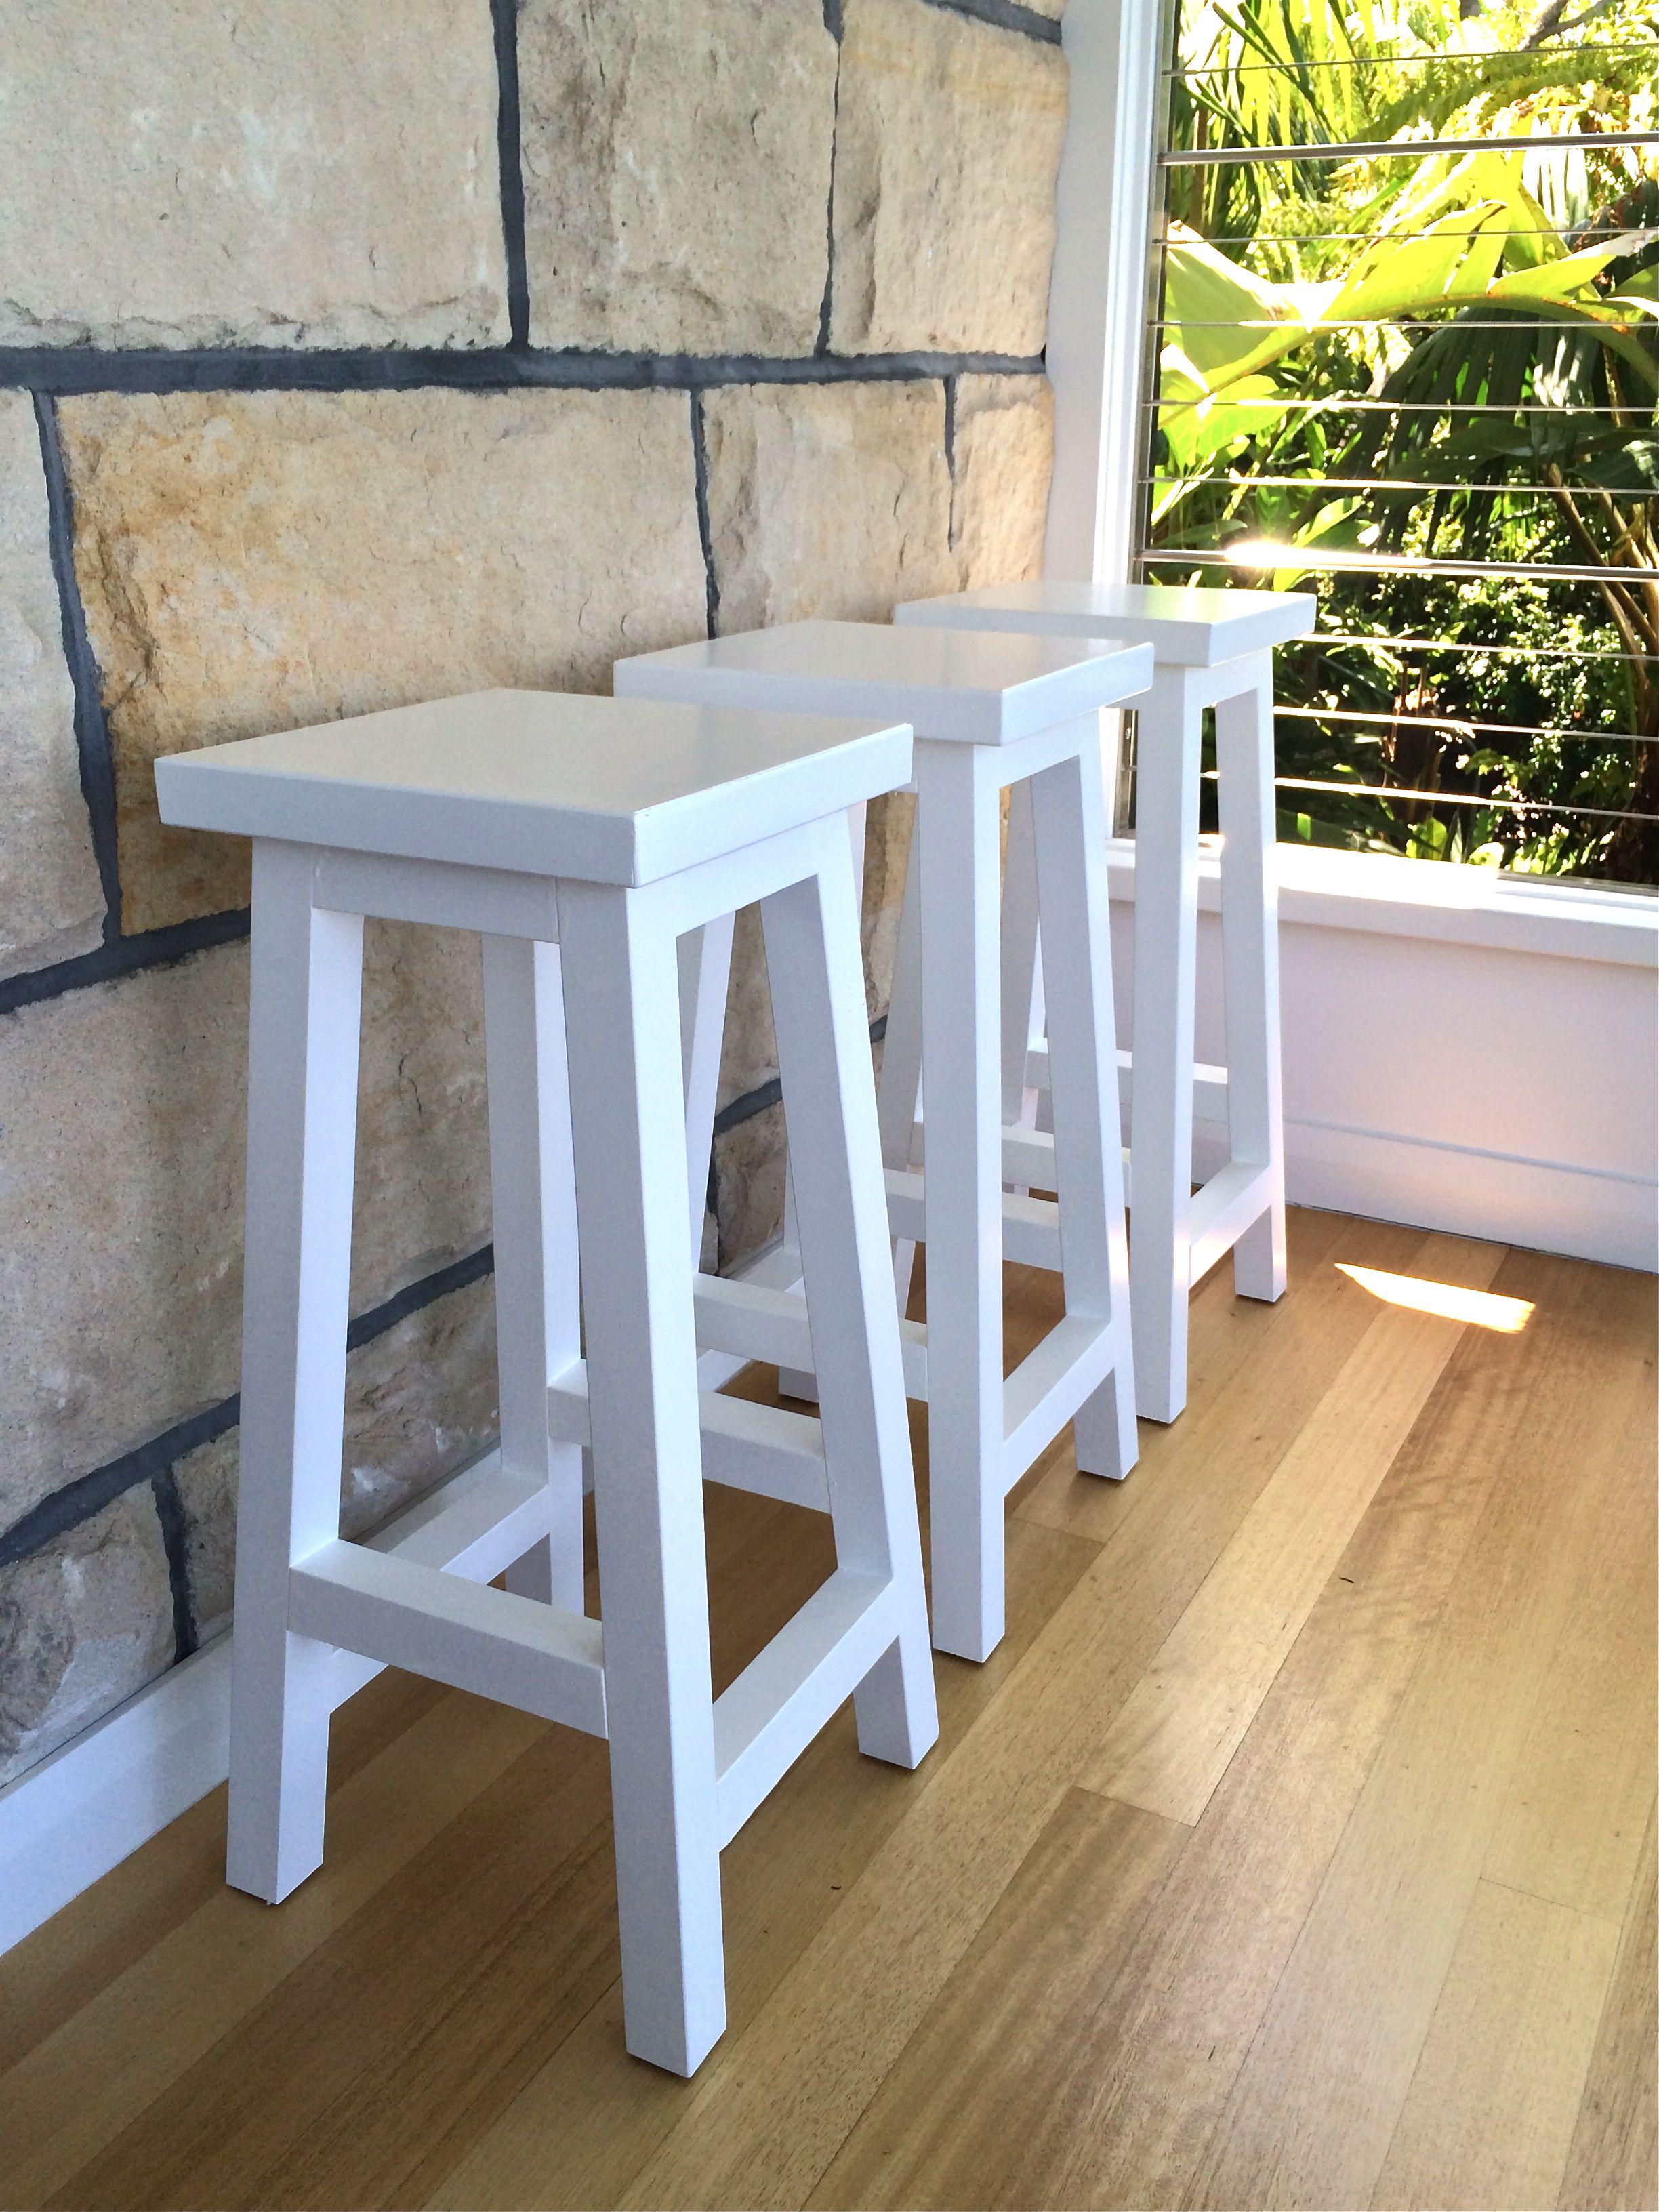 White timber bar stools   Timber bar stools, Bar stools, Stool